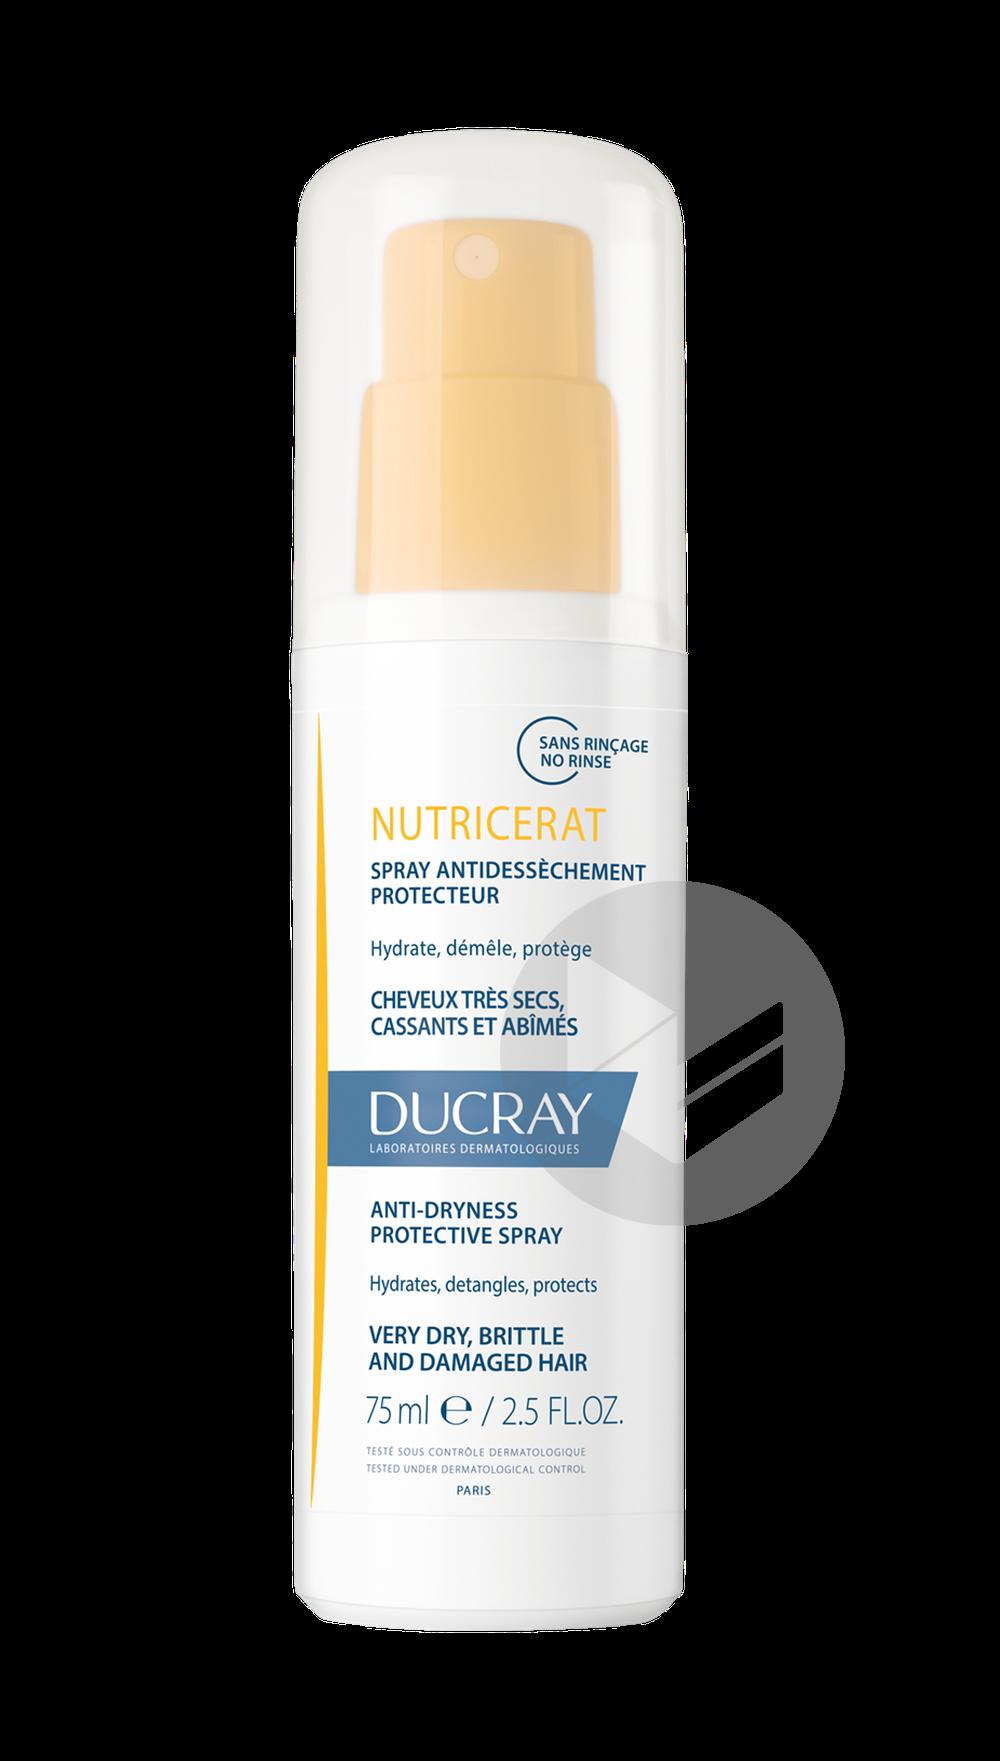 Nutricerat Spray Antidessechement Protecteur